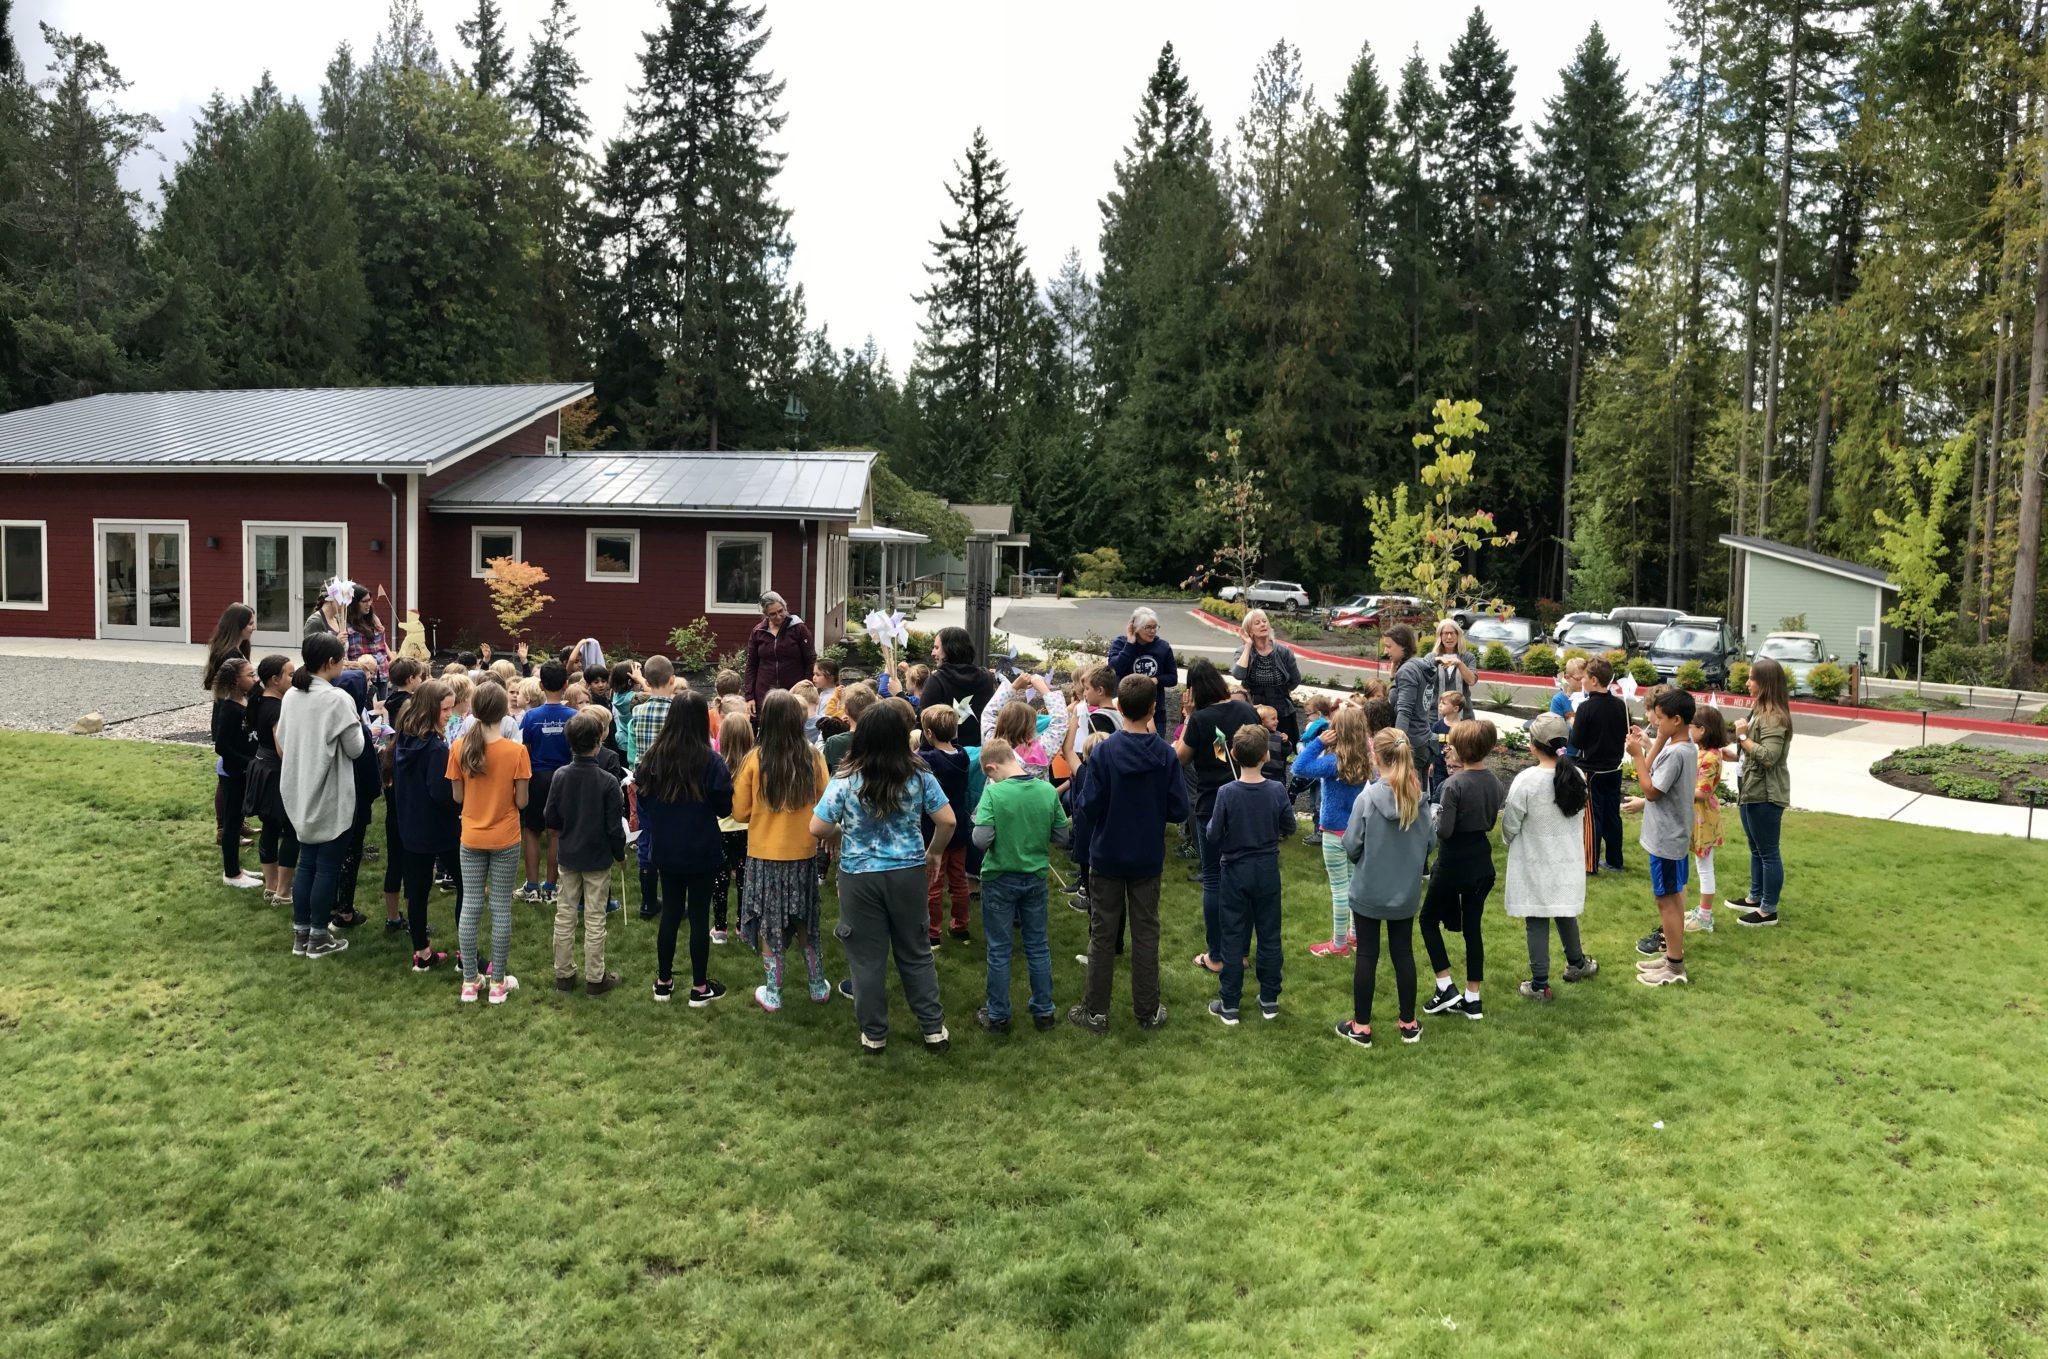 International Day Of Peace 2019 - Montessori Country School intended for Bainbridge Island School District 2020 Calendar